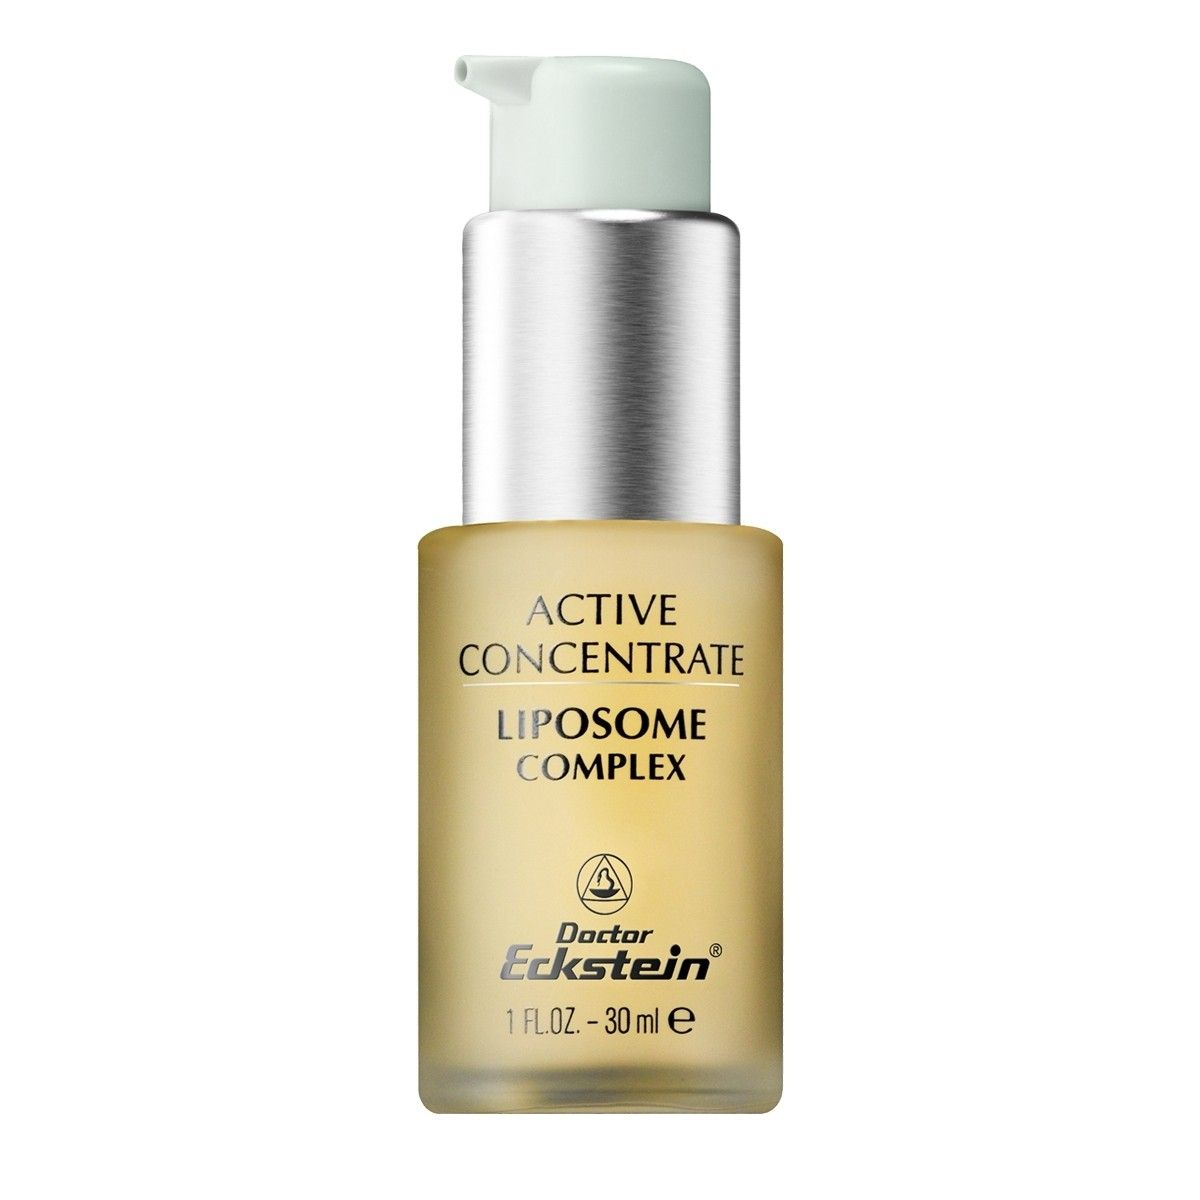 Afbeelding van Dr. Eckstein Active Concentrate Liposome Complex 30Ml Serum & concentraten Beauty